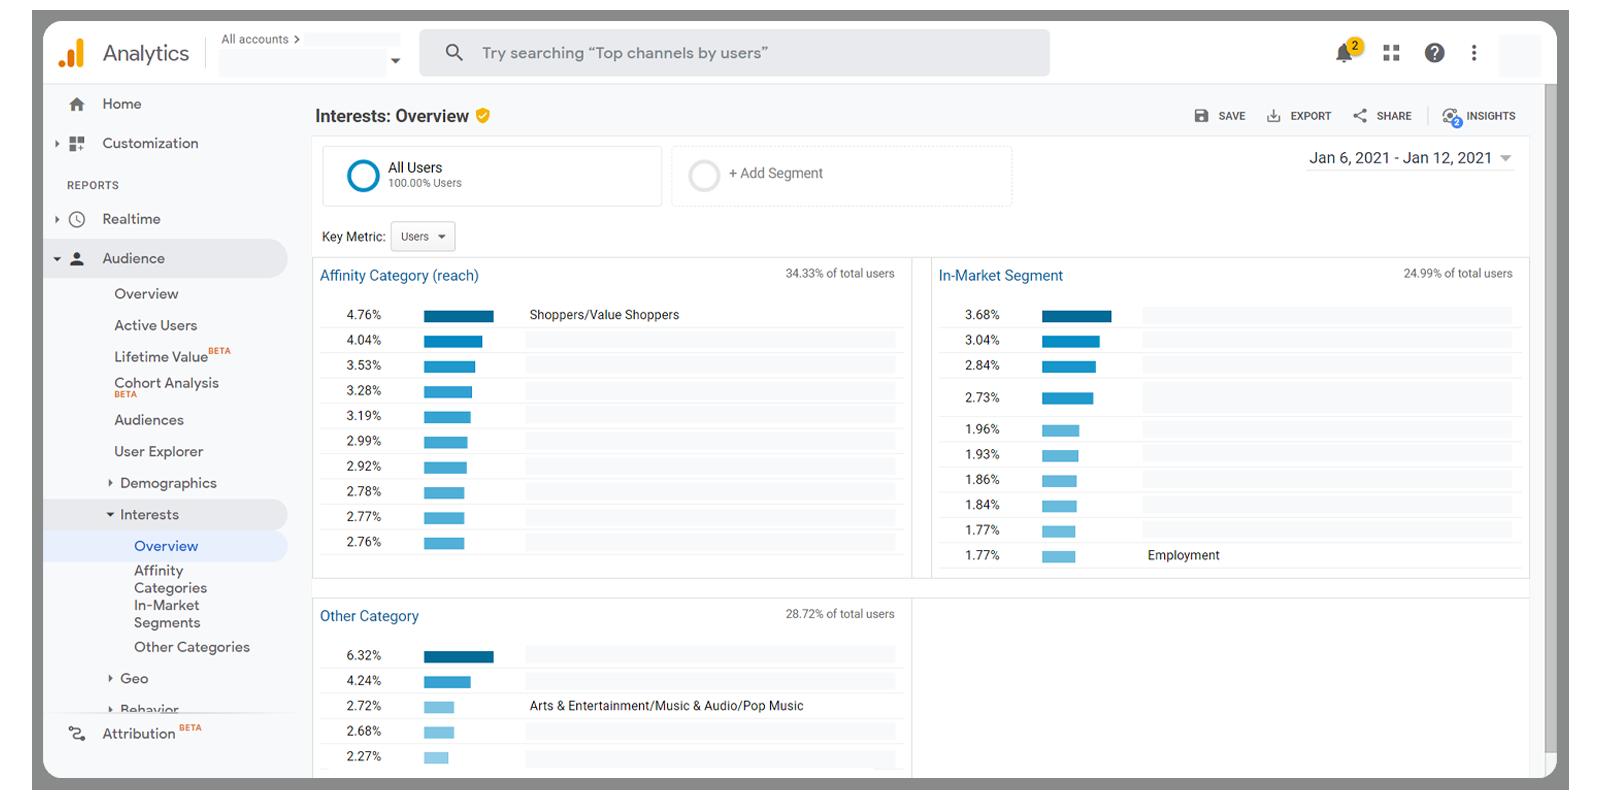 Data-Driven Marketing - ตัวอย่างข้อมูลความสนใจของลูกค้า